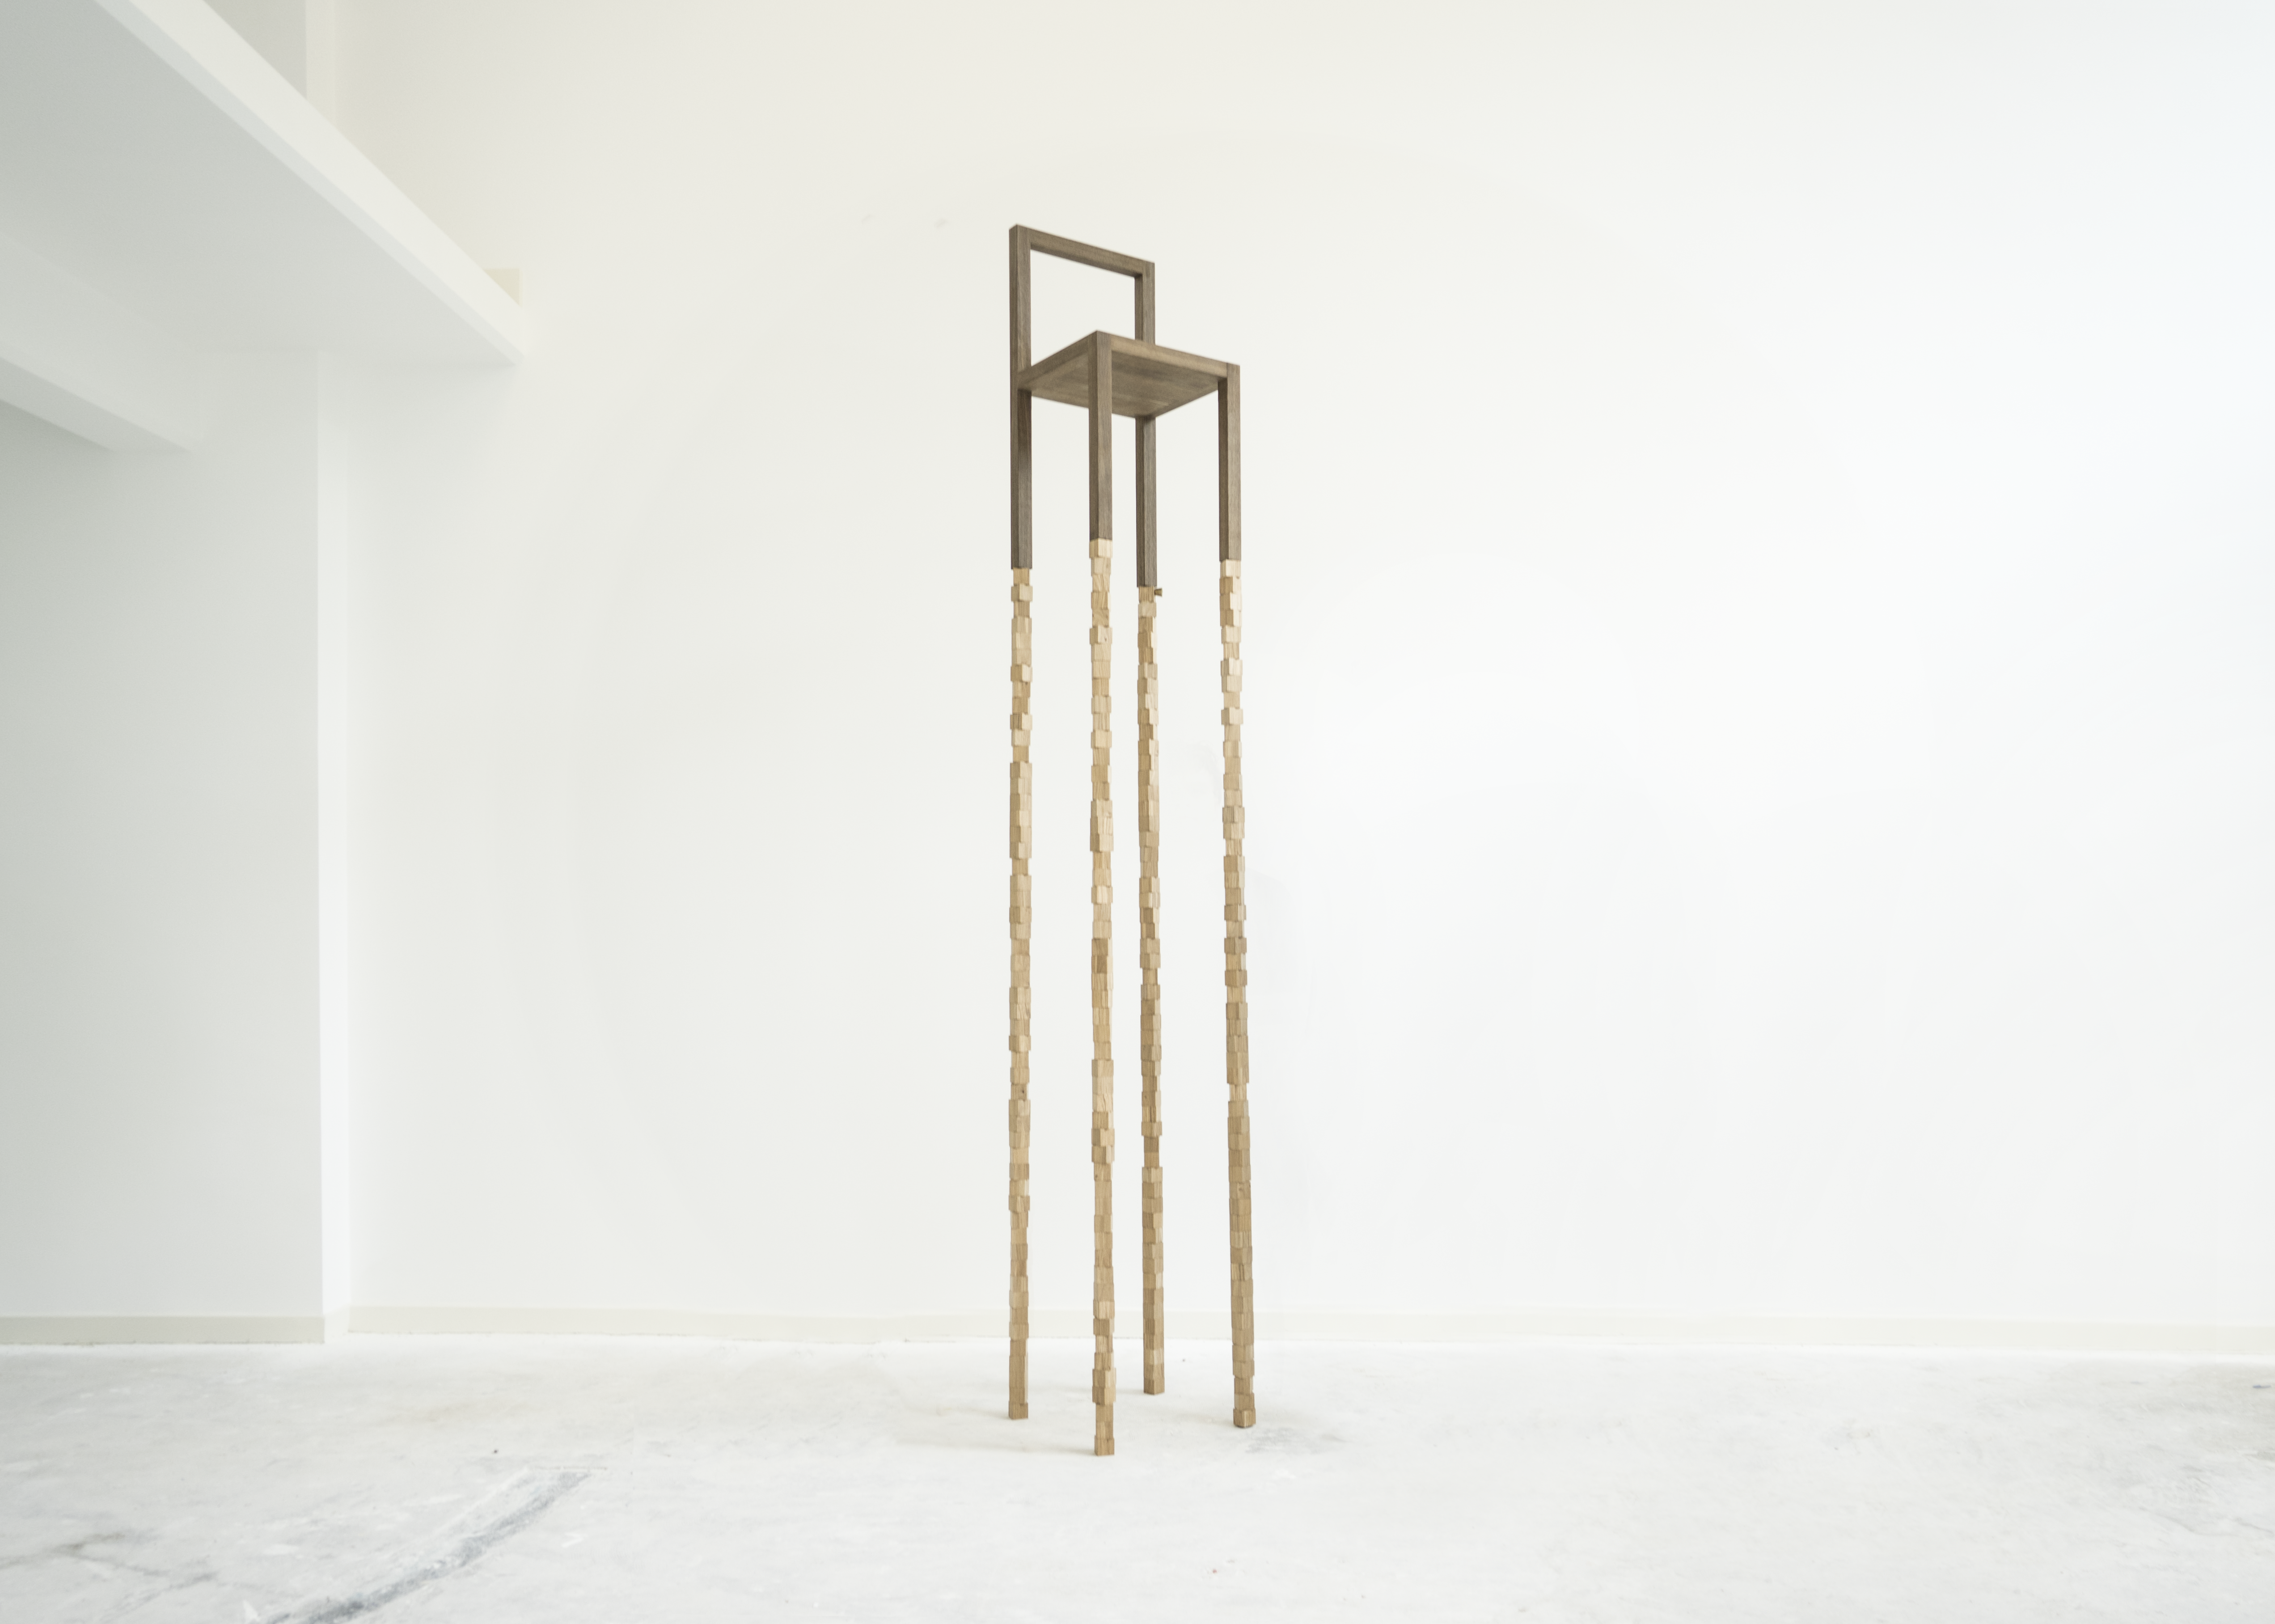 <p>The Urge to Sit Dry door Studio Boris Maas</p>